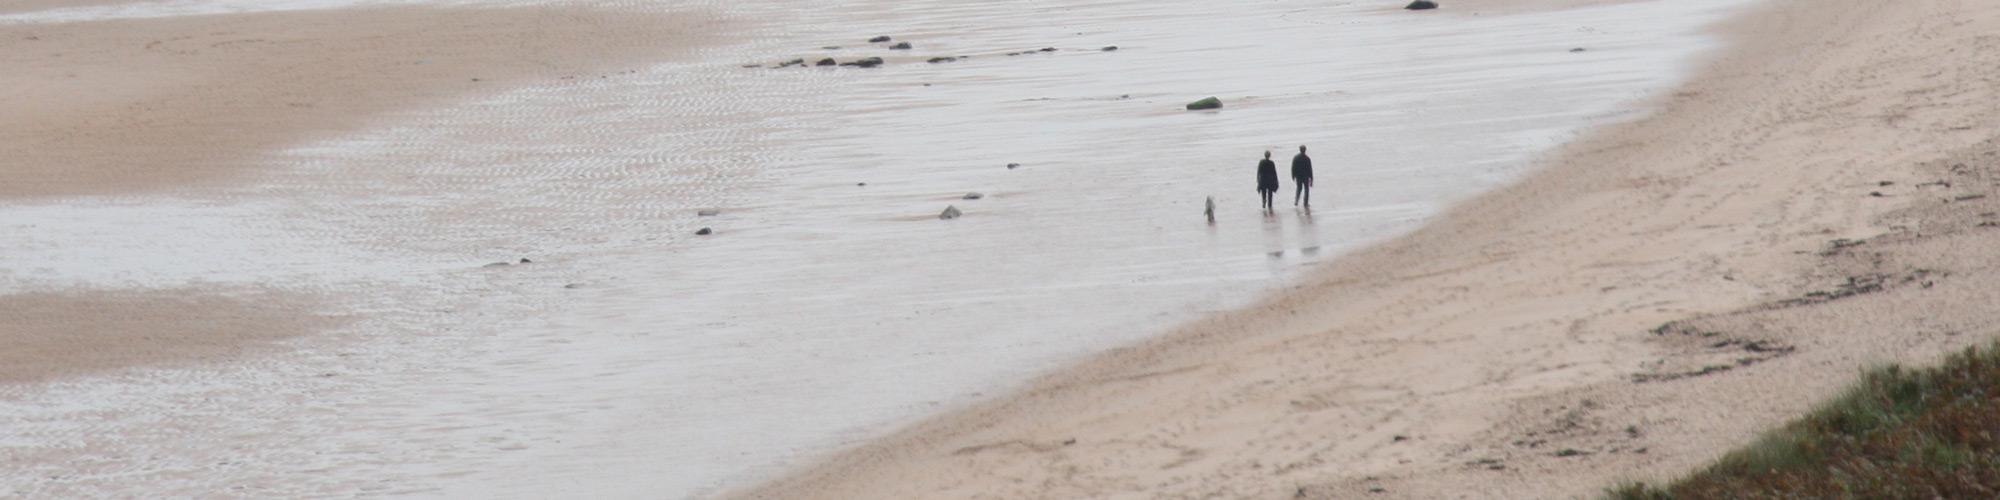 Beach of Embleton